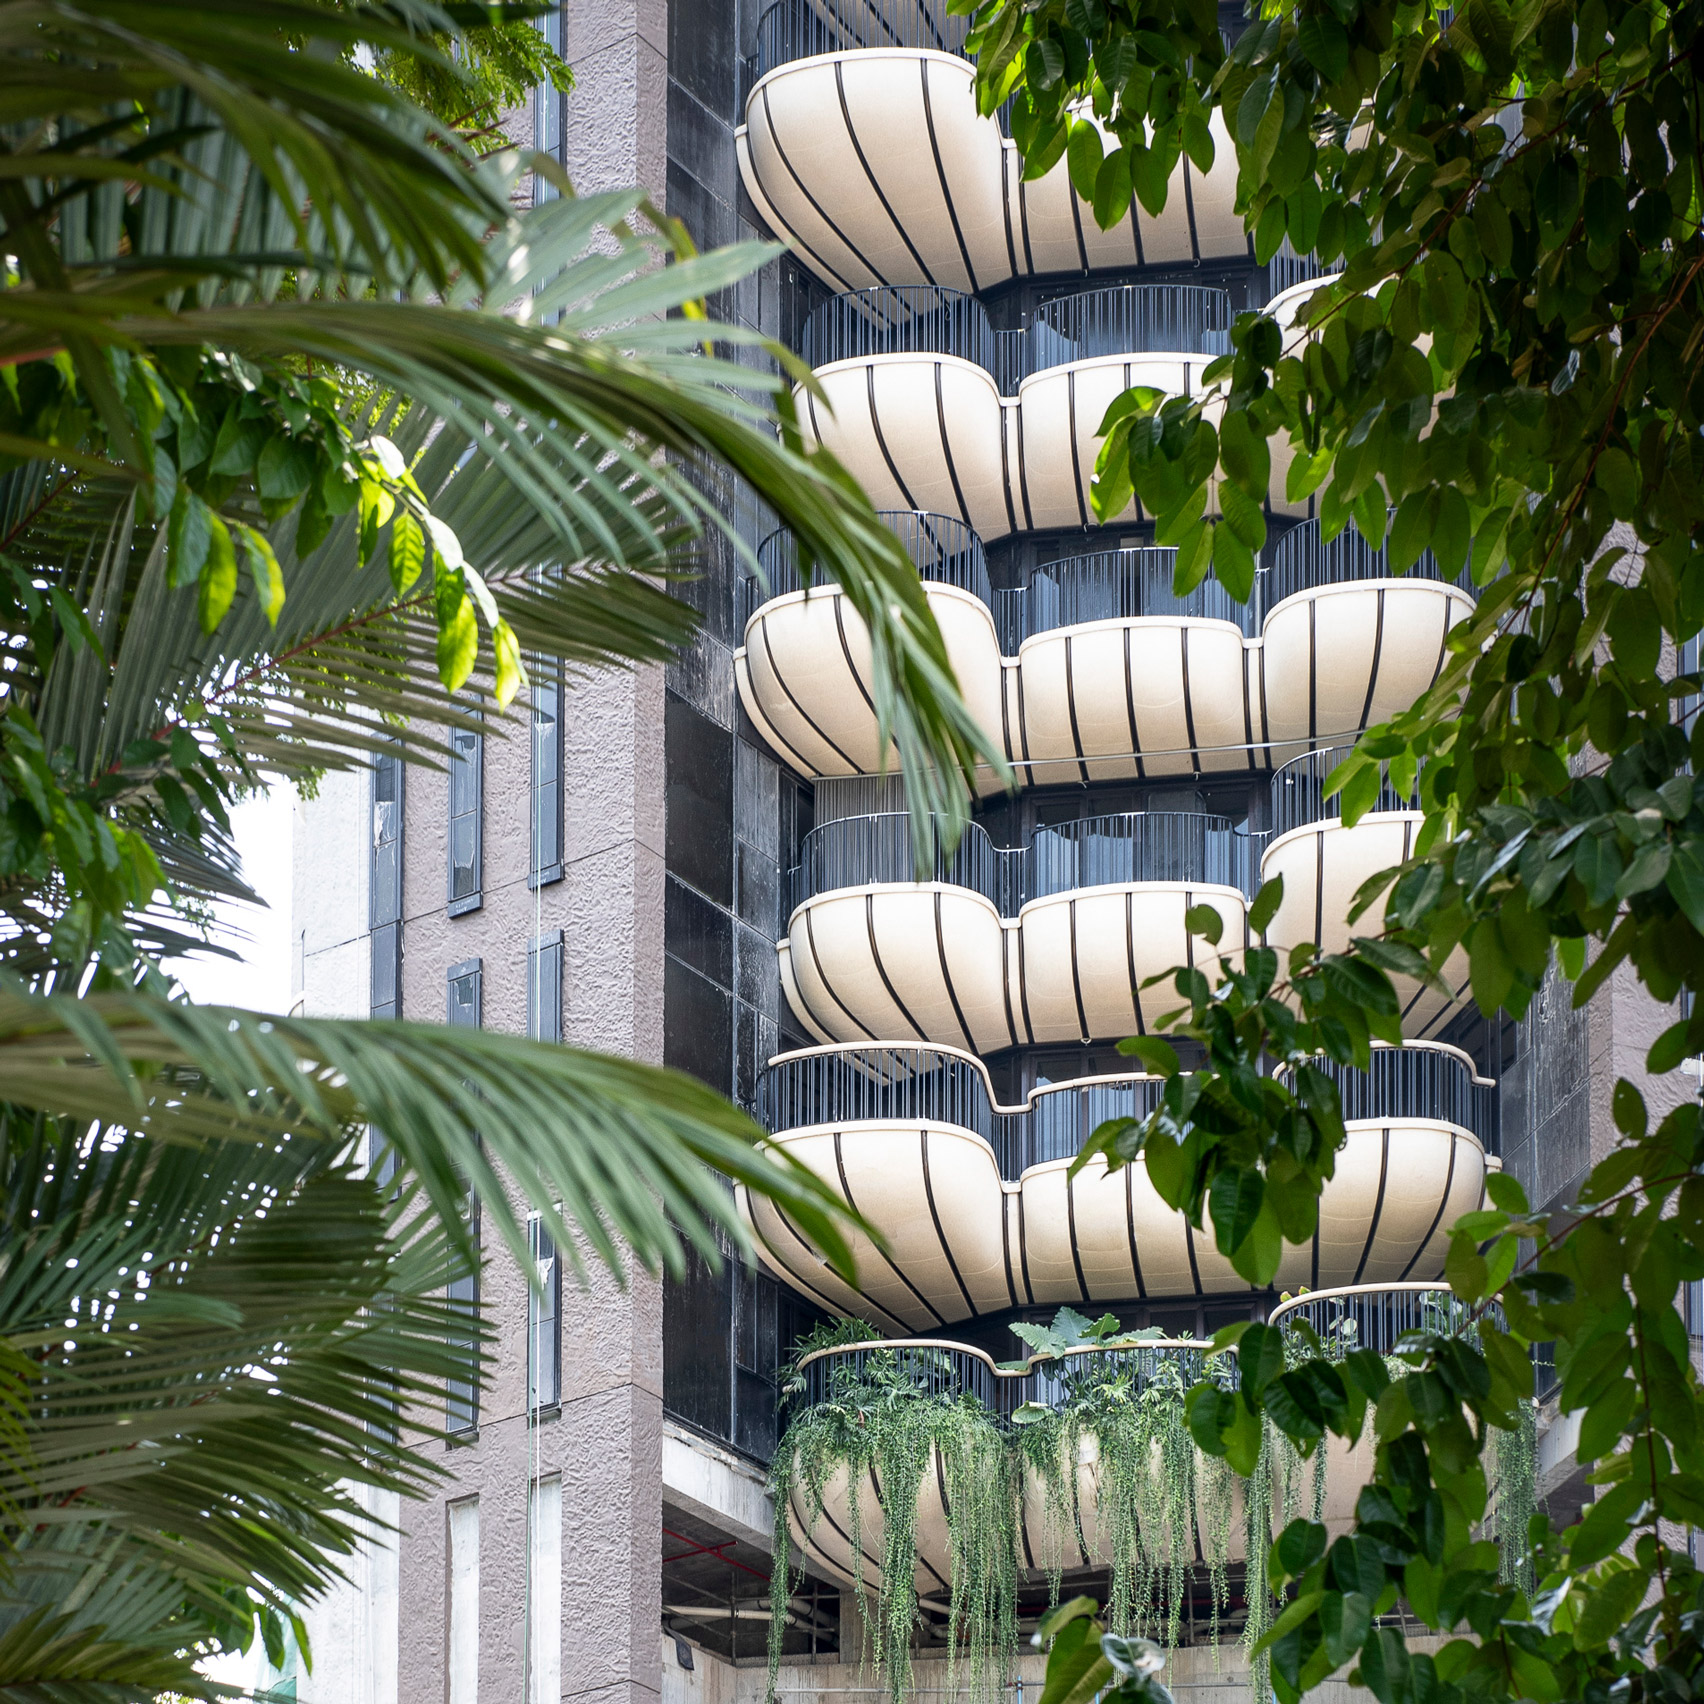 12 new buildings to look forward to in 2020: Eden by Heatherwick Studio